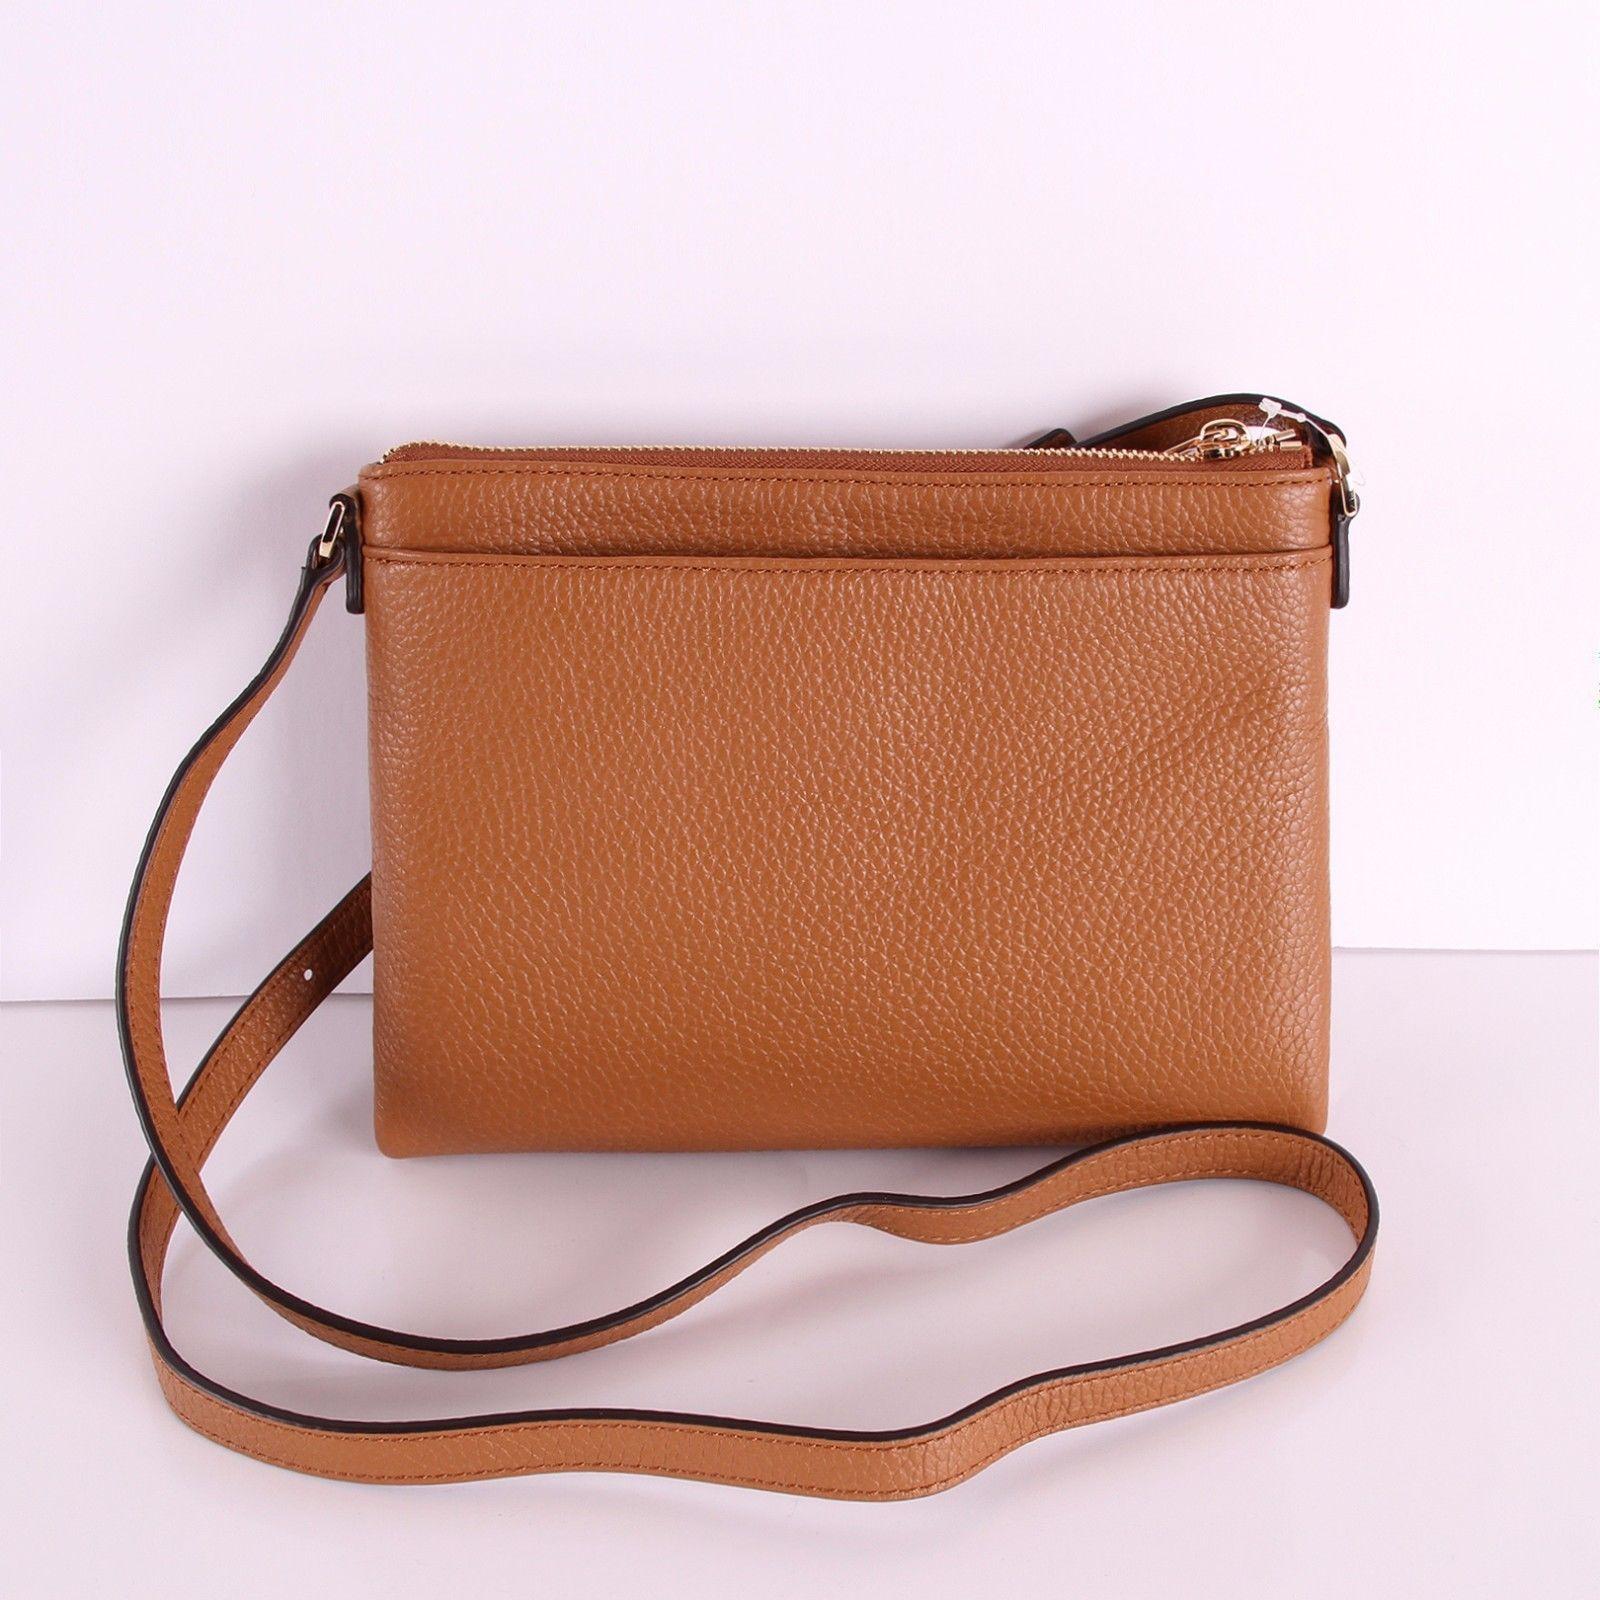 983f464b8ad6 ... france nwt michael kors leather or signature pvc fulton ew crossbody  bag handbag 98.99 ecfa9 ea844